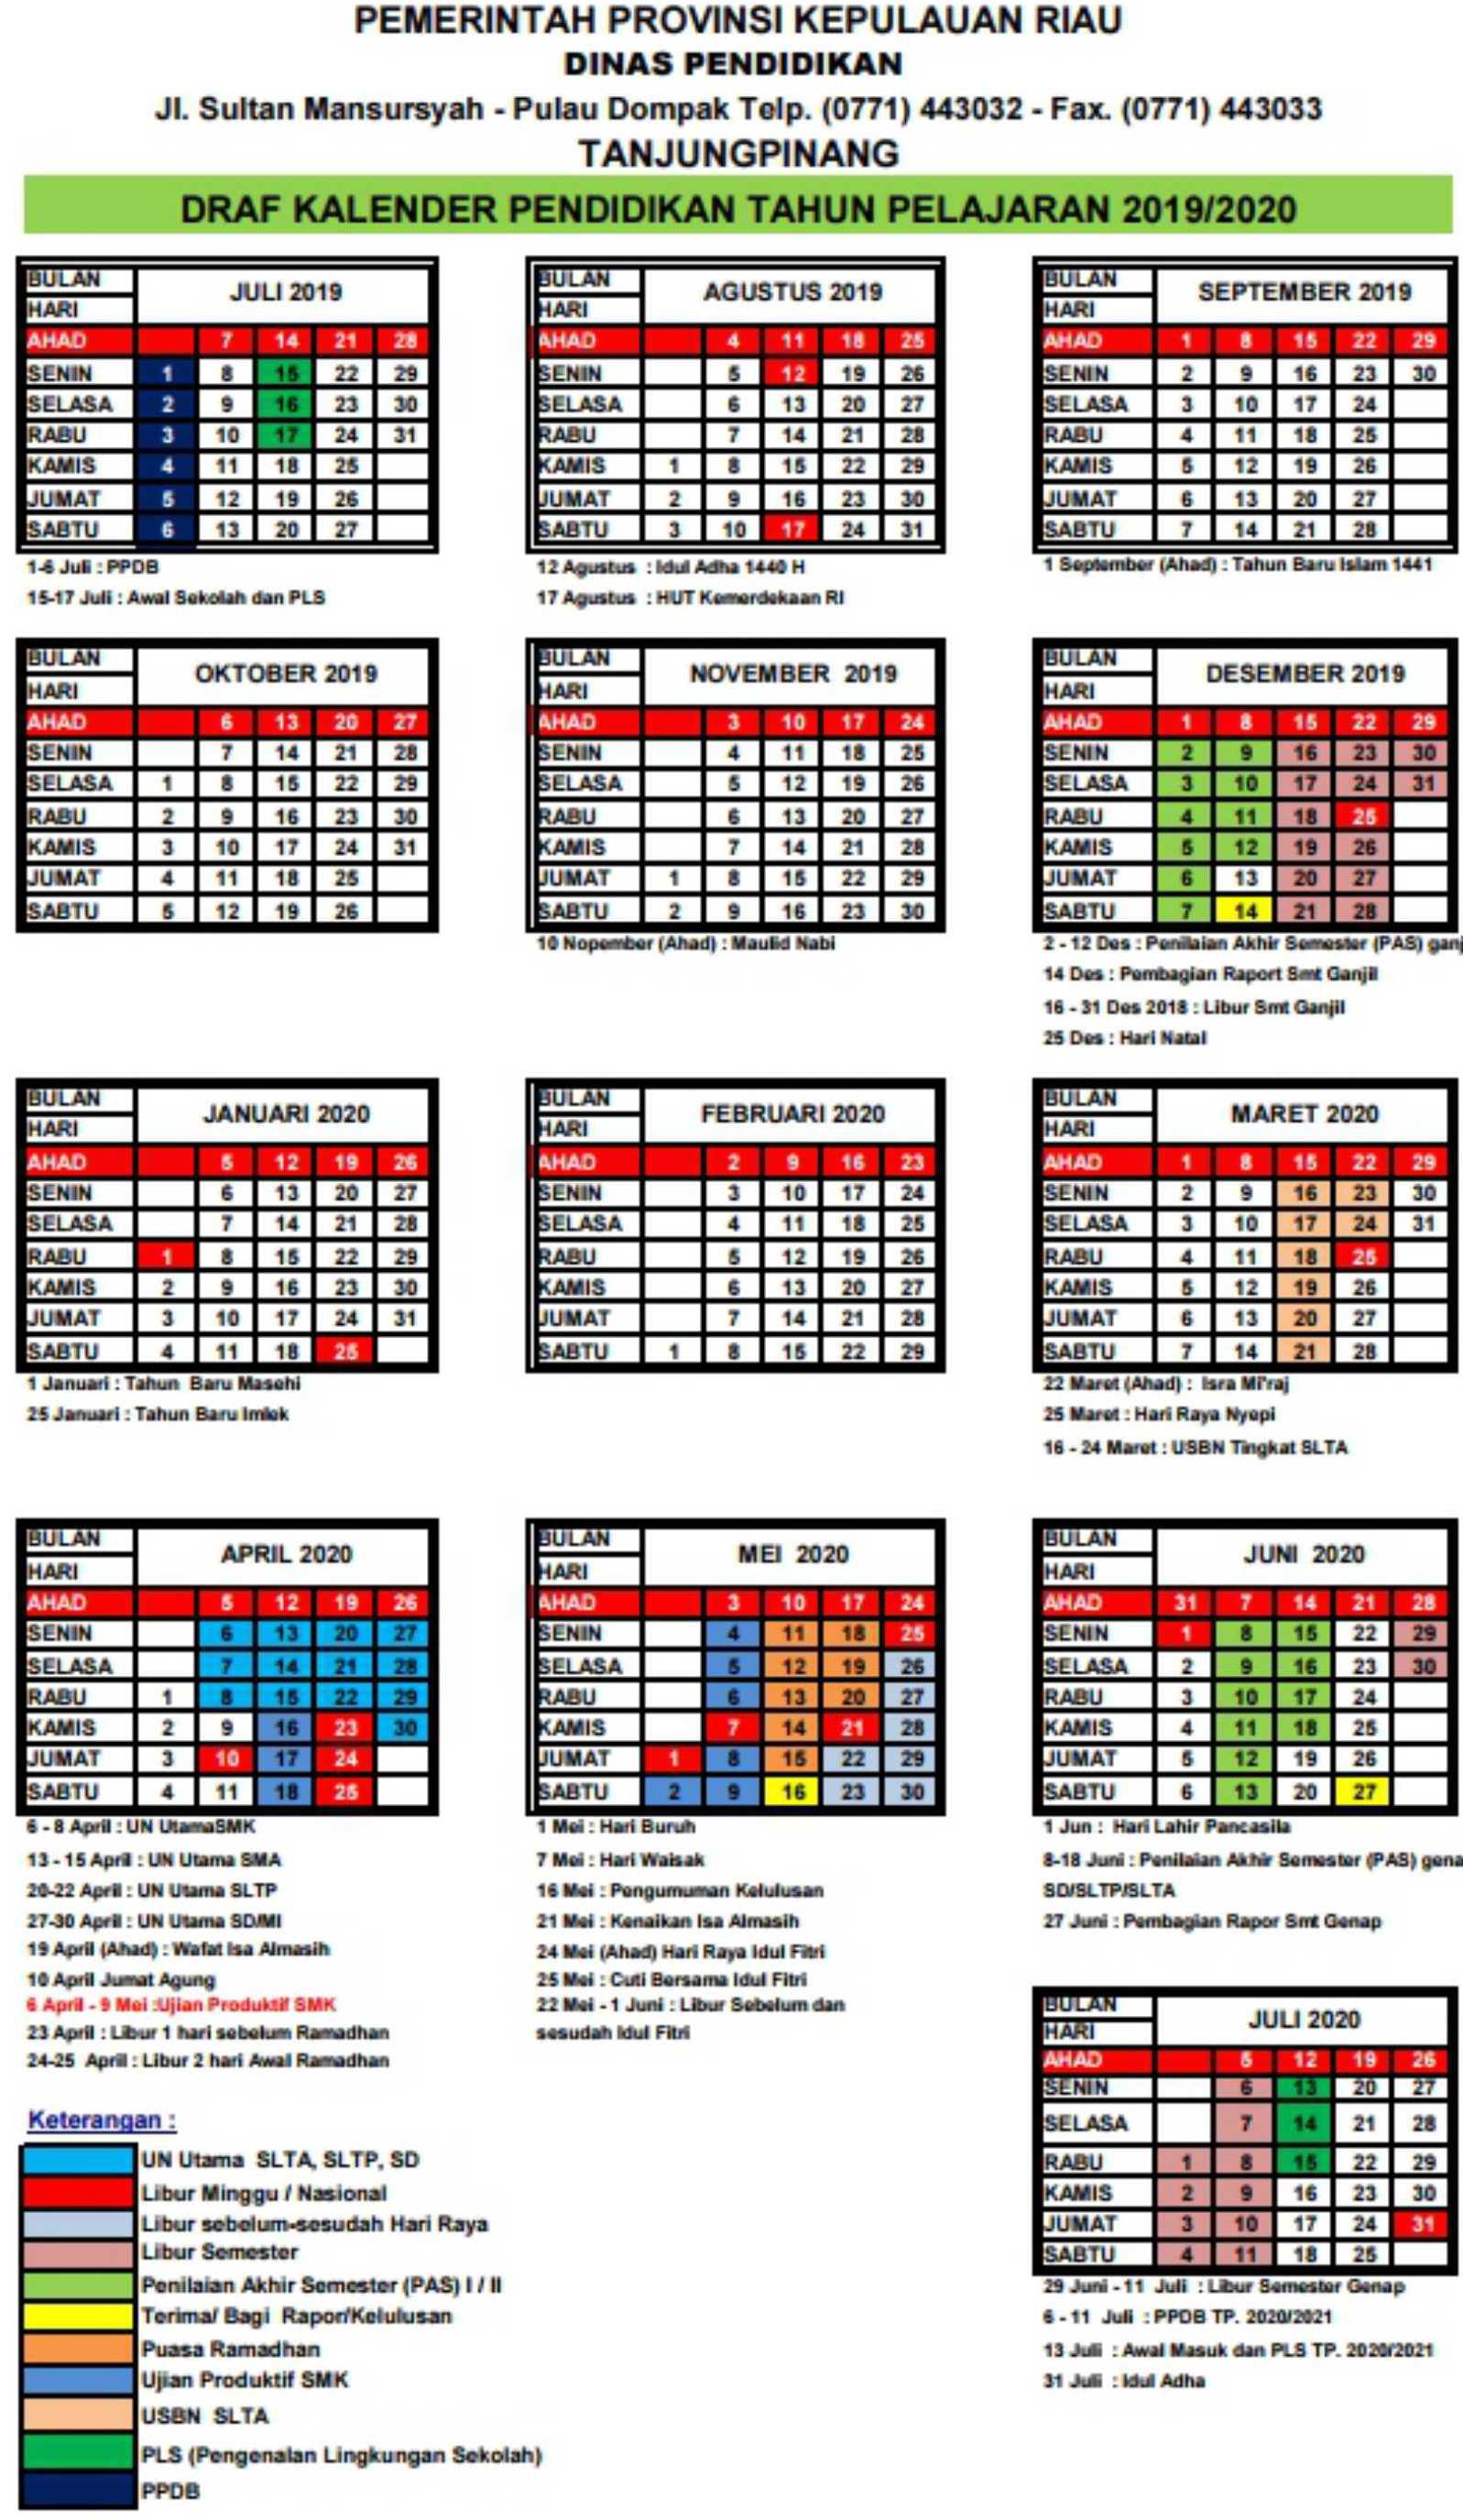 Kalender Pendidikan Provinsi Riau tahun pelajaran 2019 - 2020